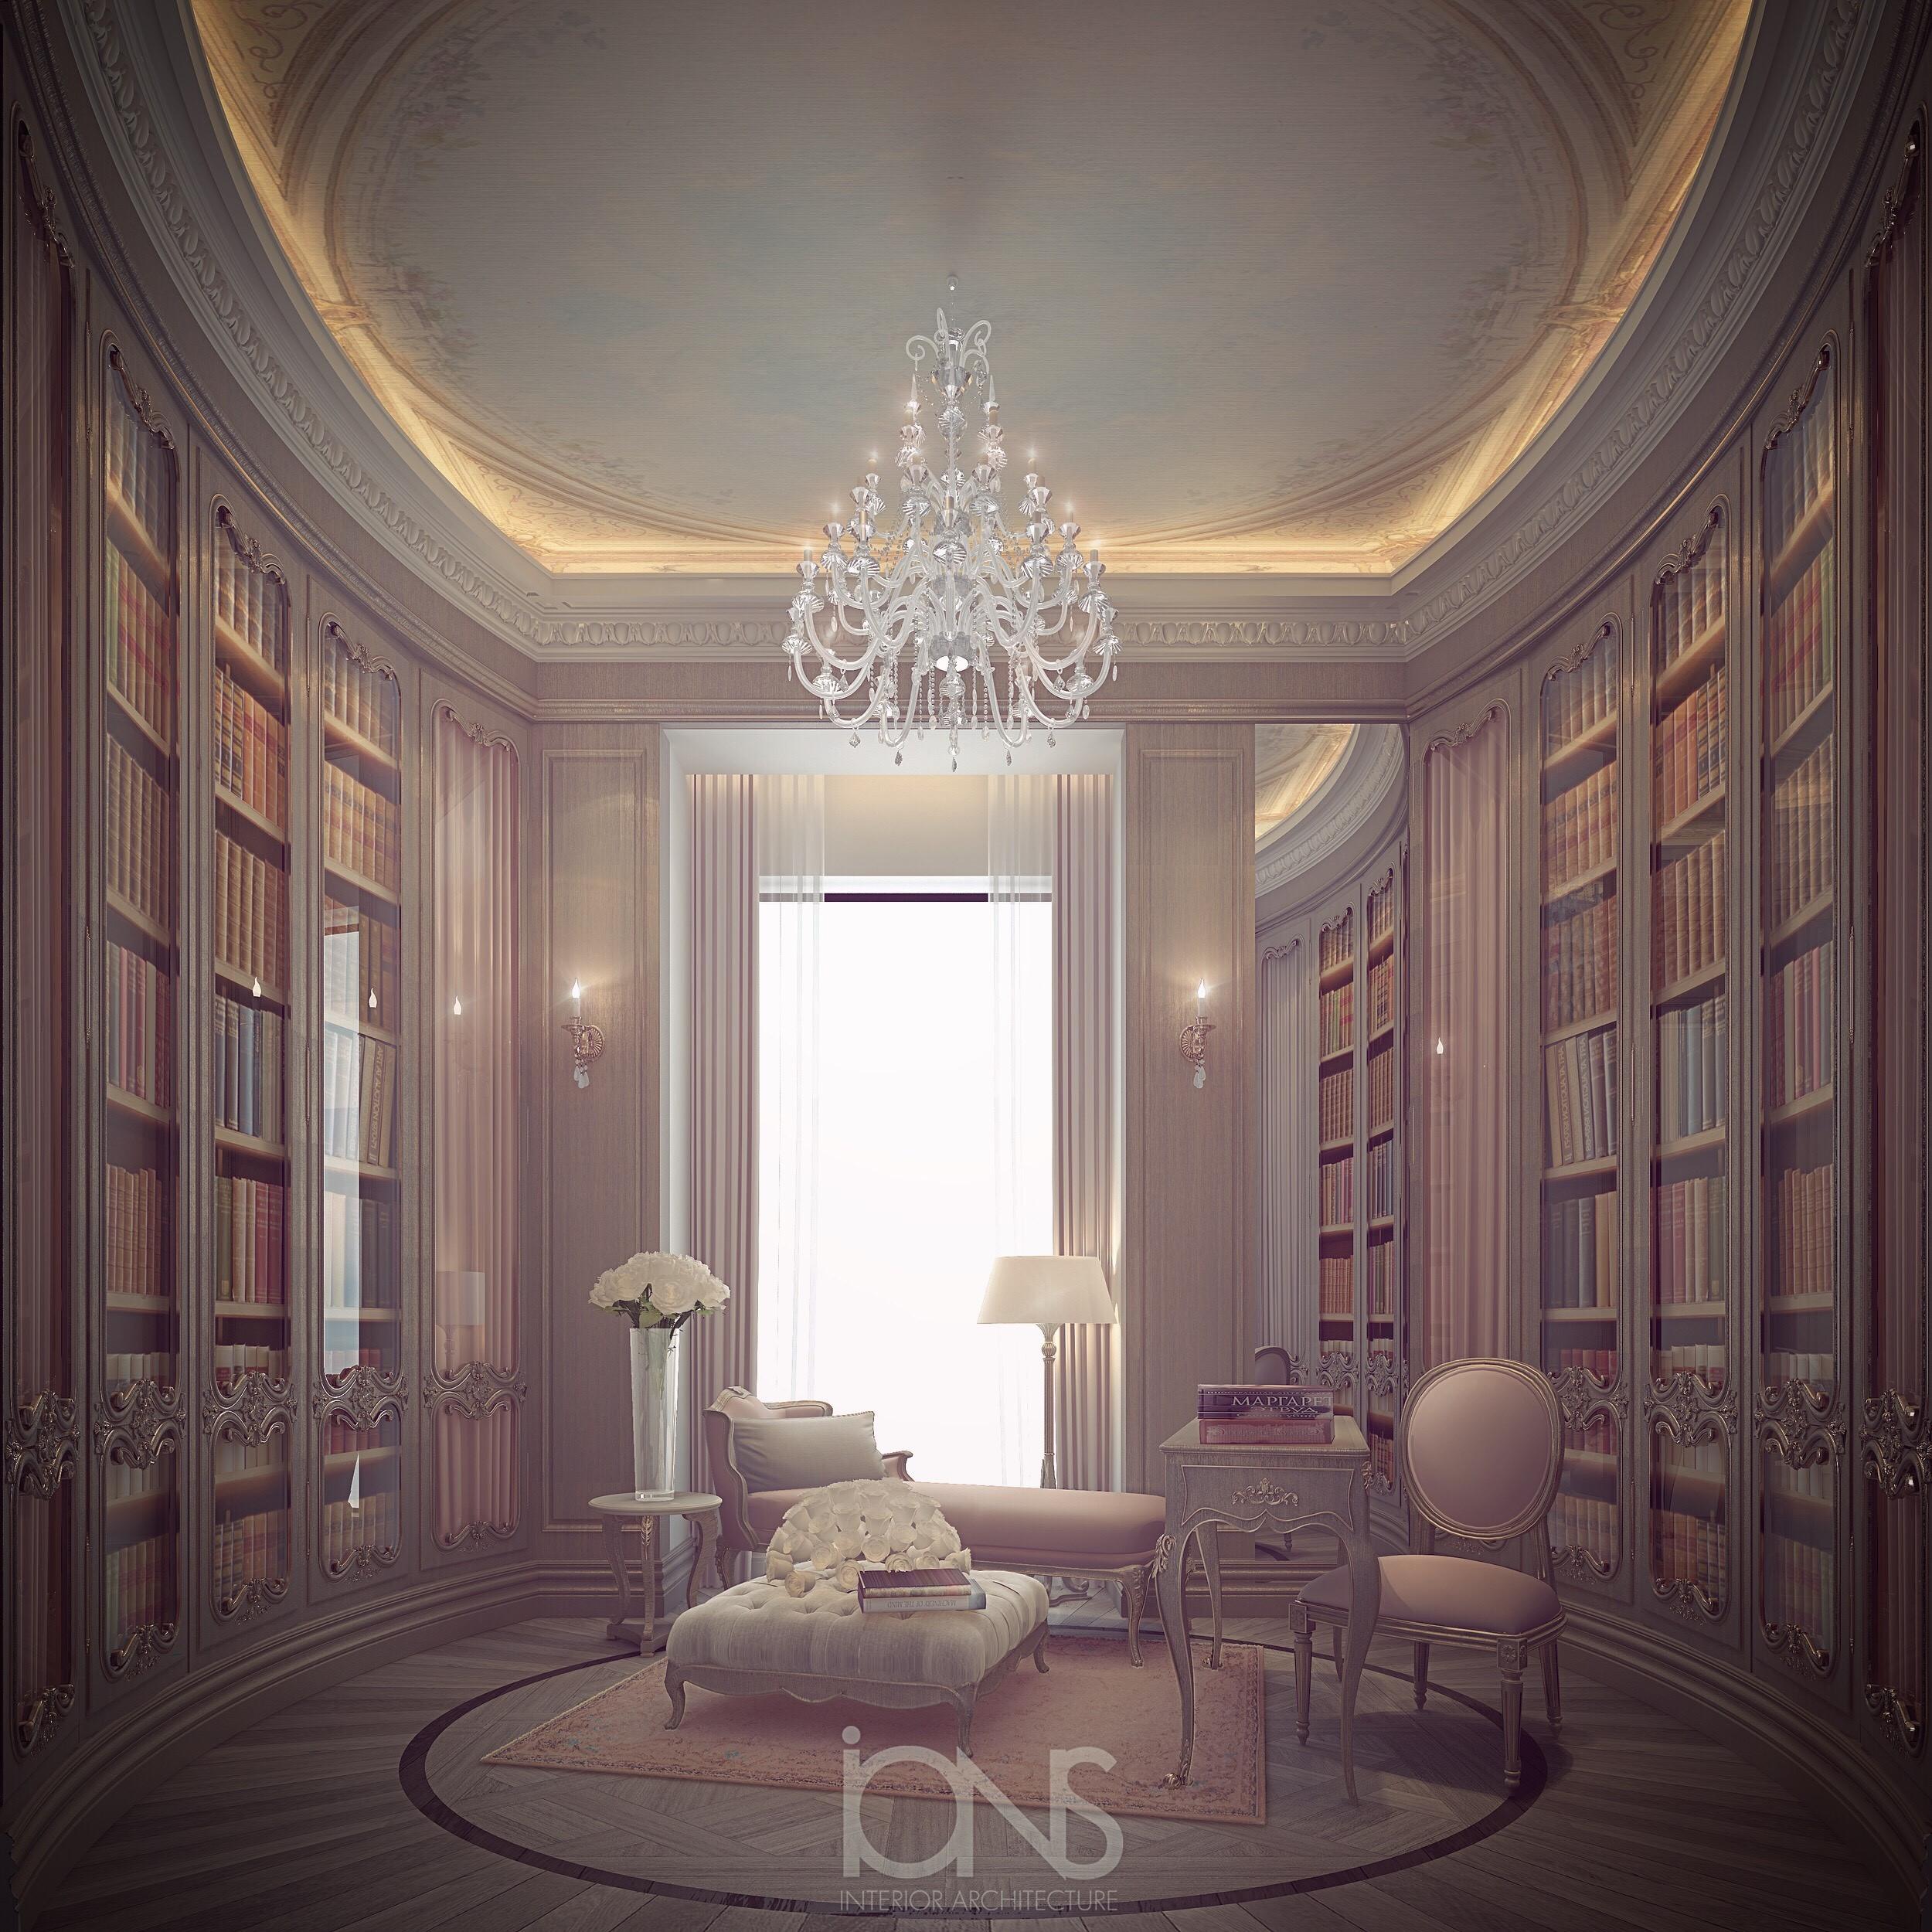 Library -  Home Interior Design